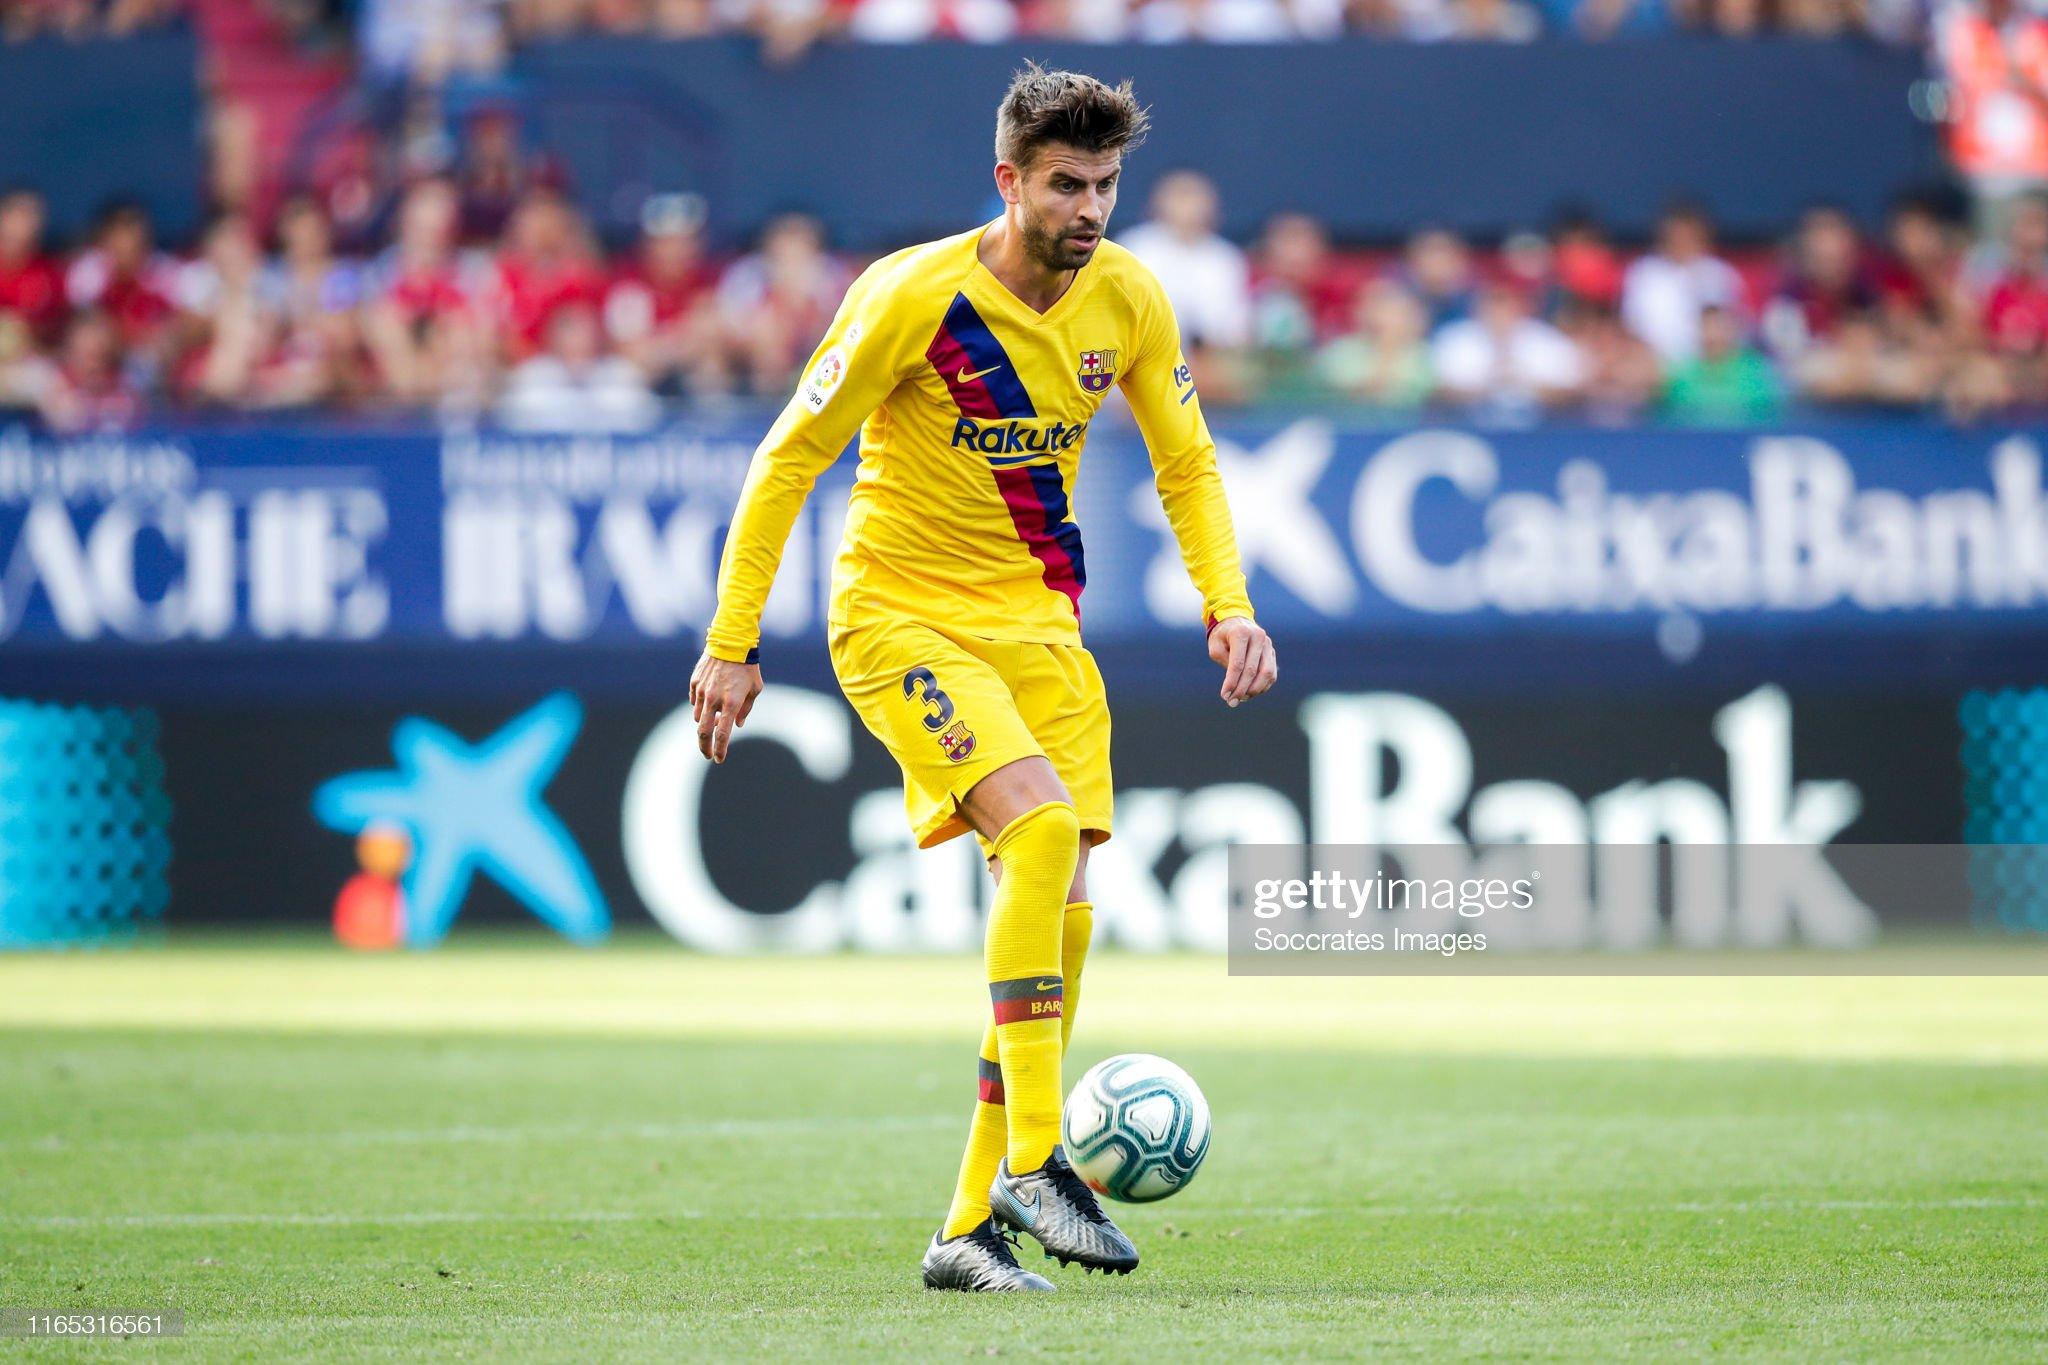 صور مباراة : أوساسونا - برشلونة 2-2 ( 31-08-2019 )  Gerard-pique-of-fc-barcelona-during-the-la-liga-santander-match-v-picture-id1165316561?s=2048x2048